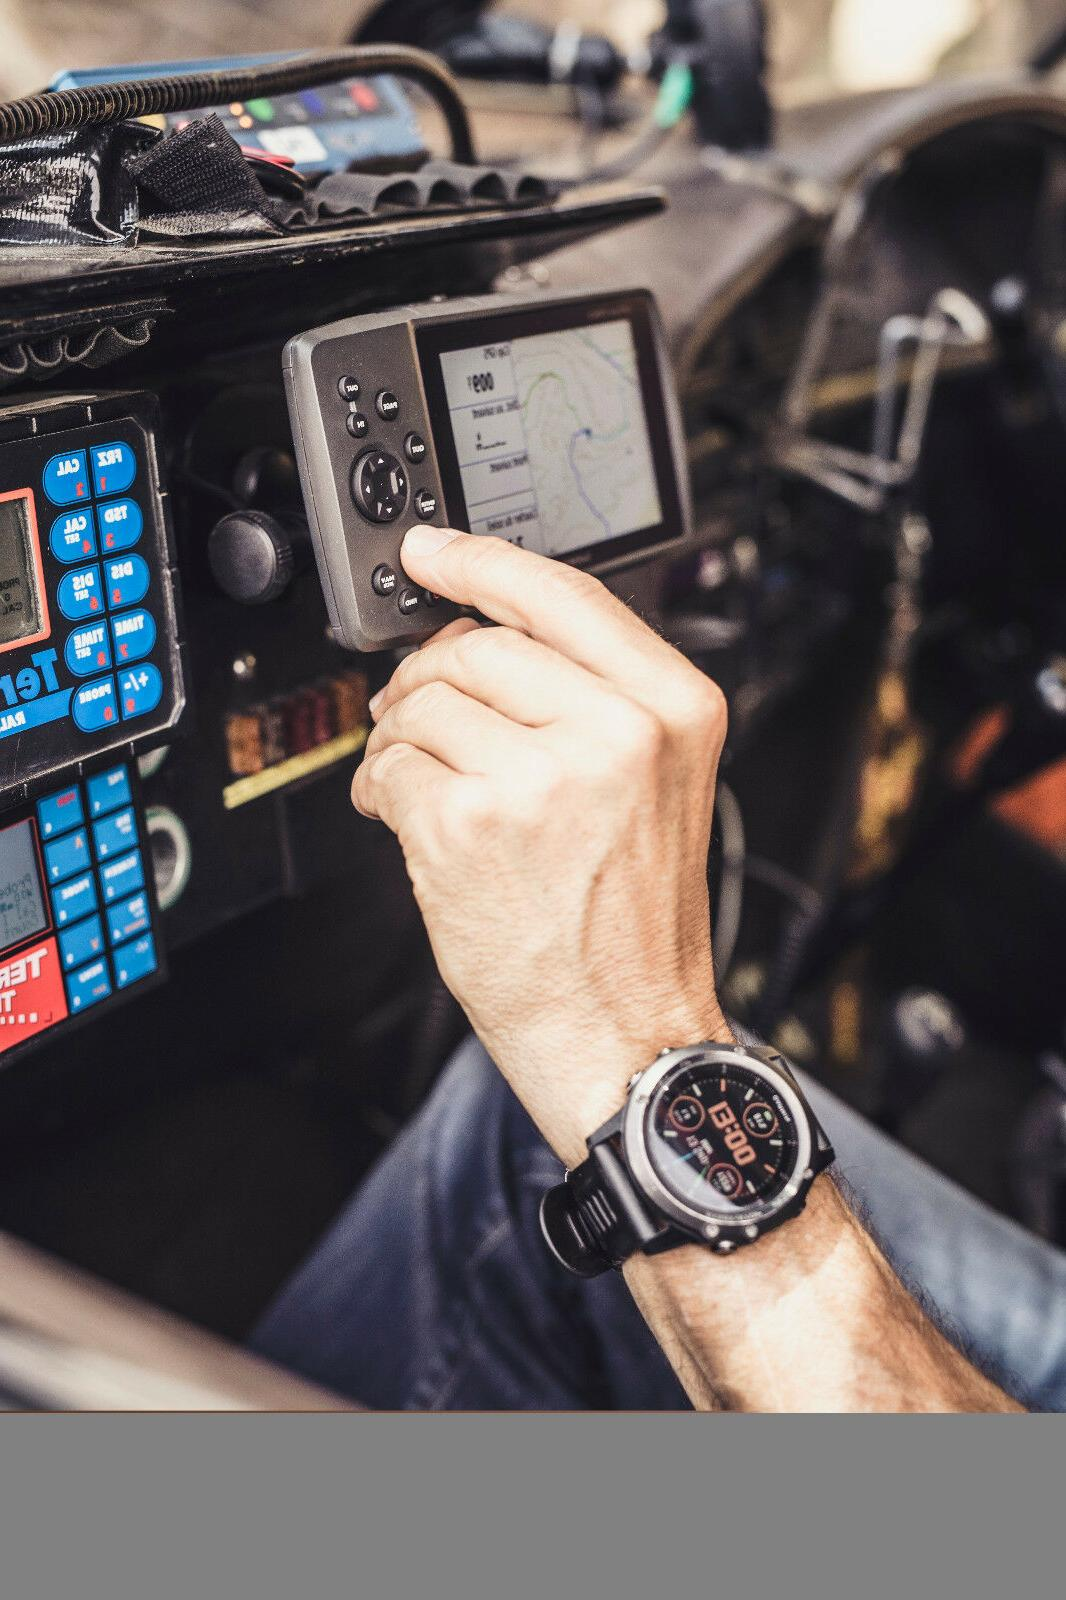 NWB All-terrain GPS Navigator Advanced Mapping